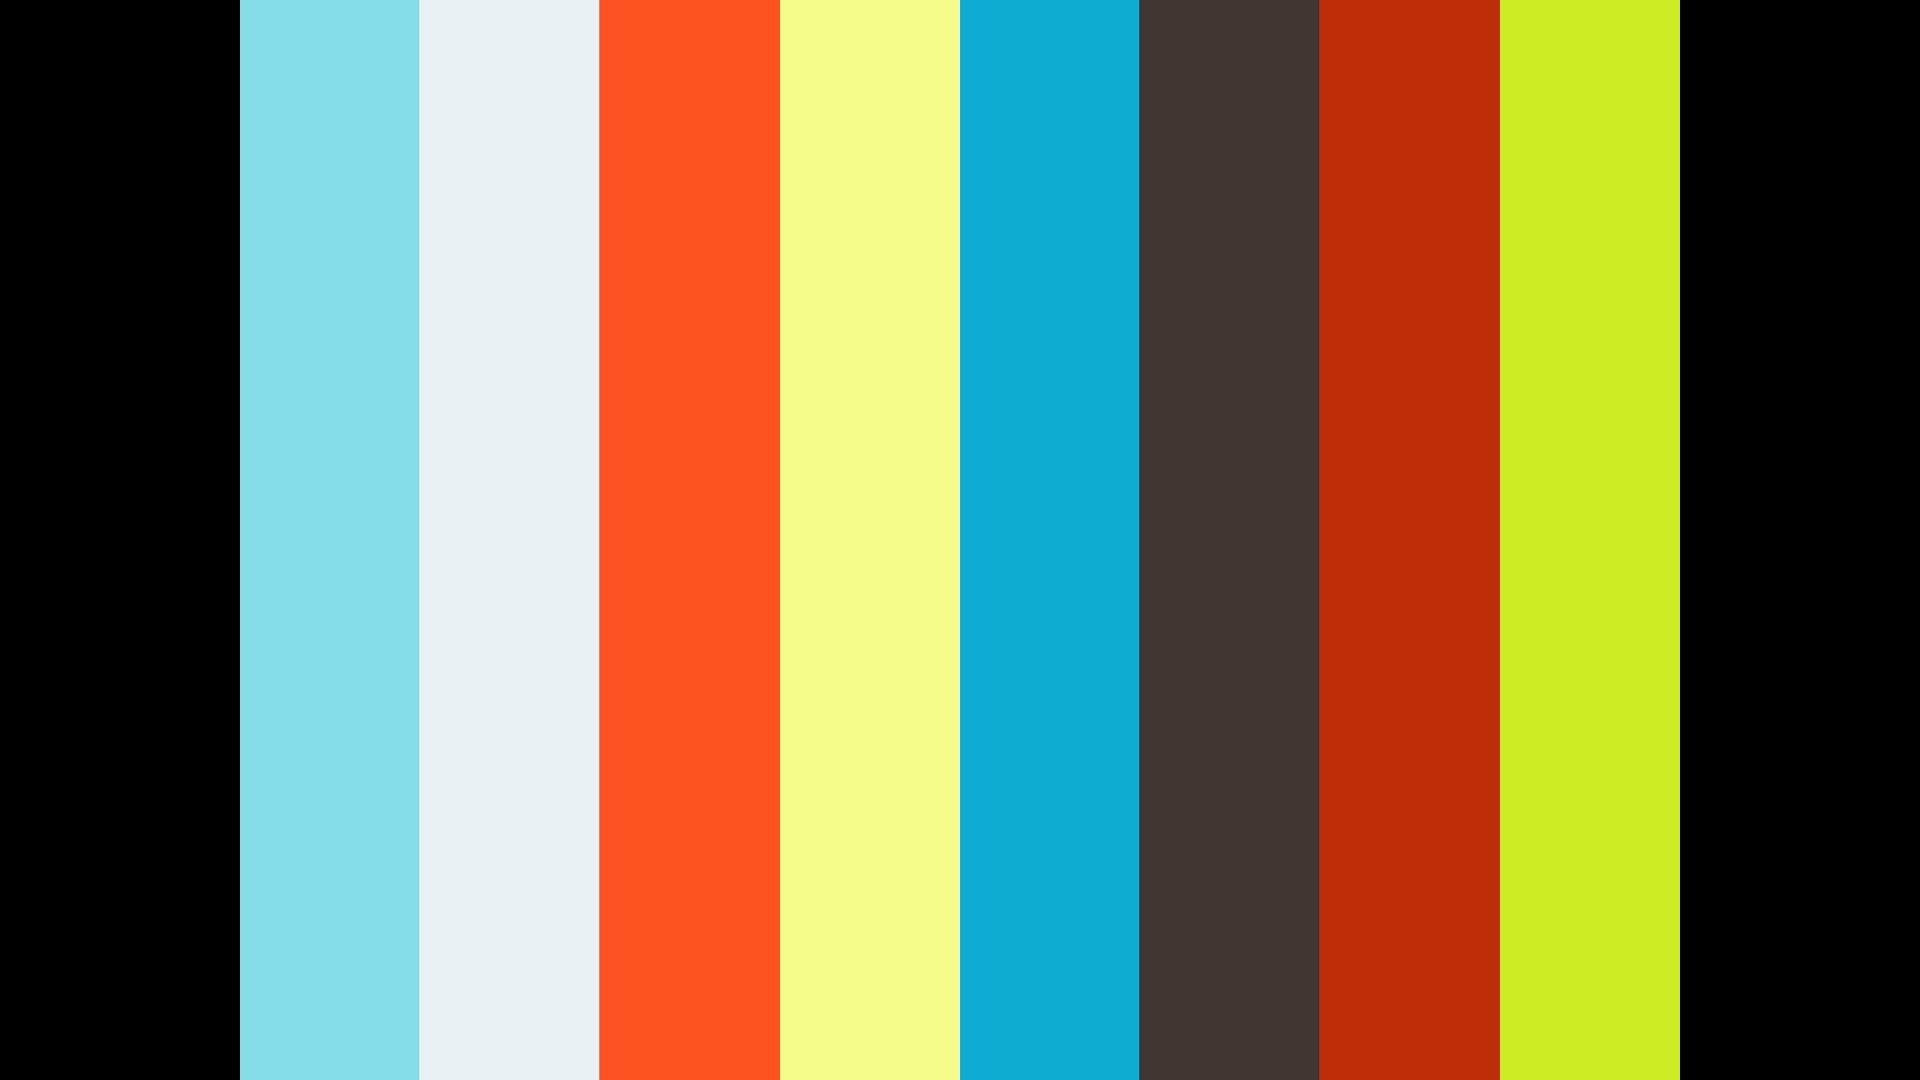 Slider. Light theme. 720x1280